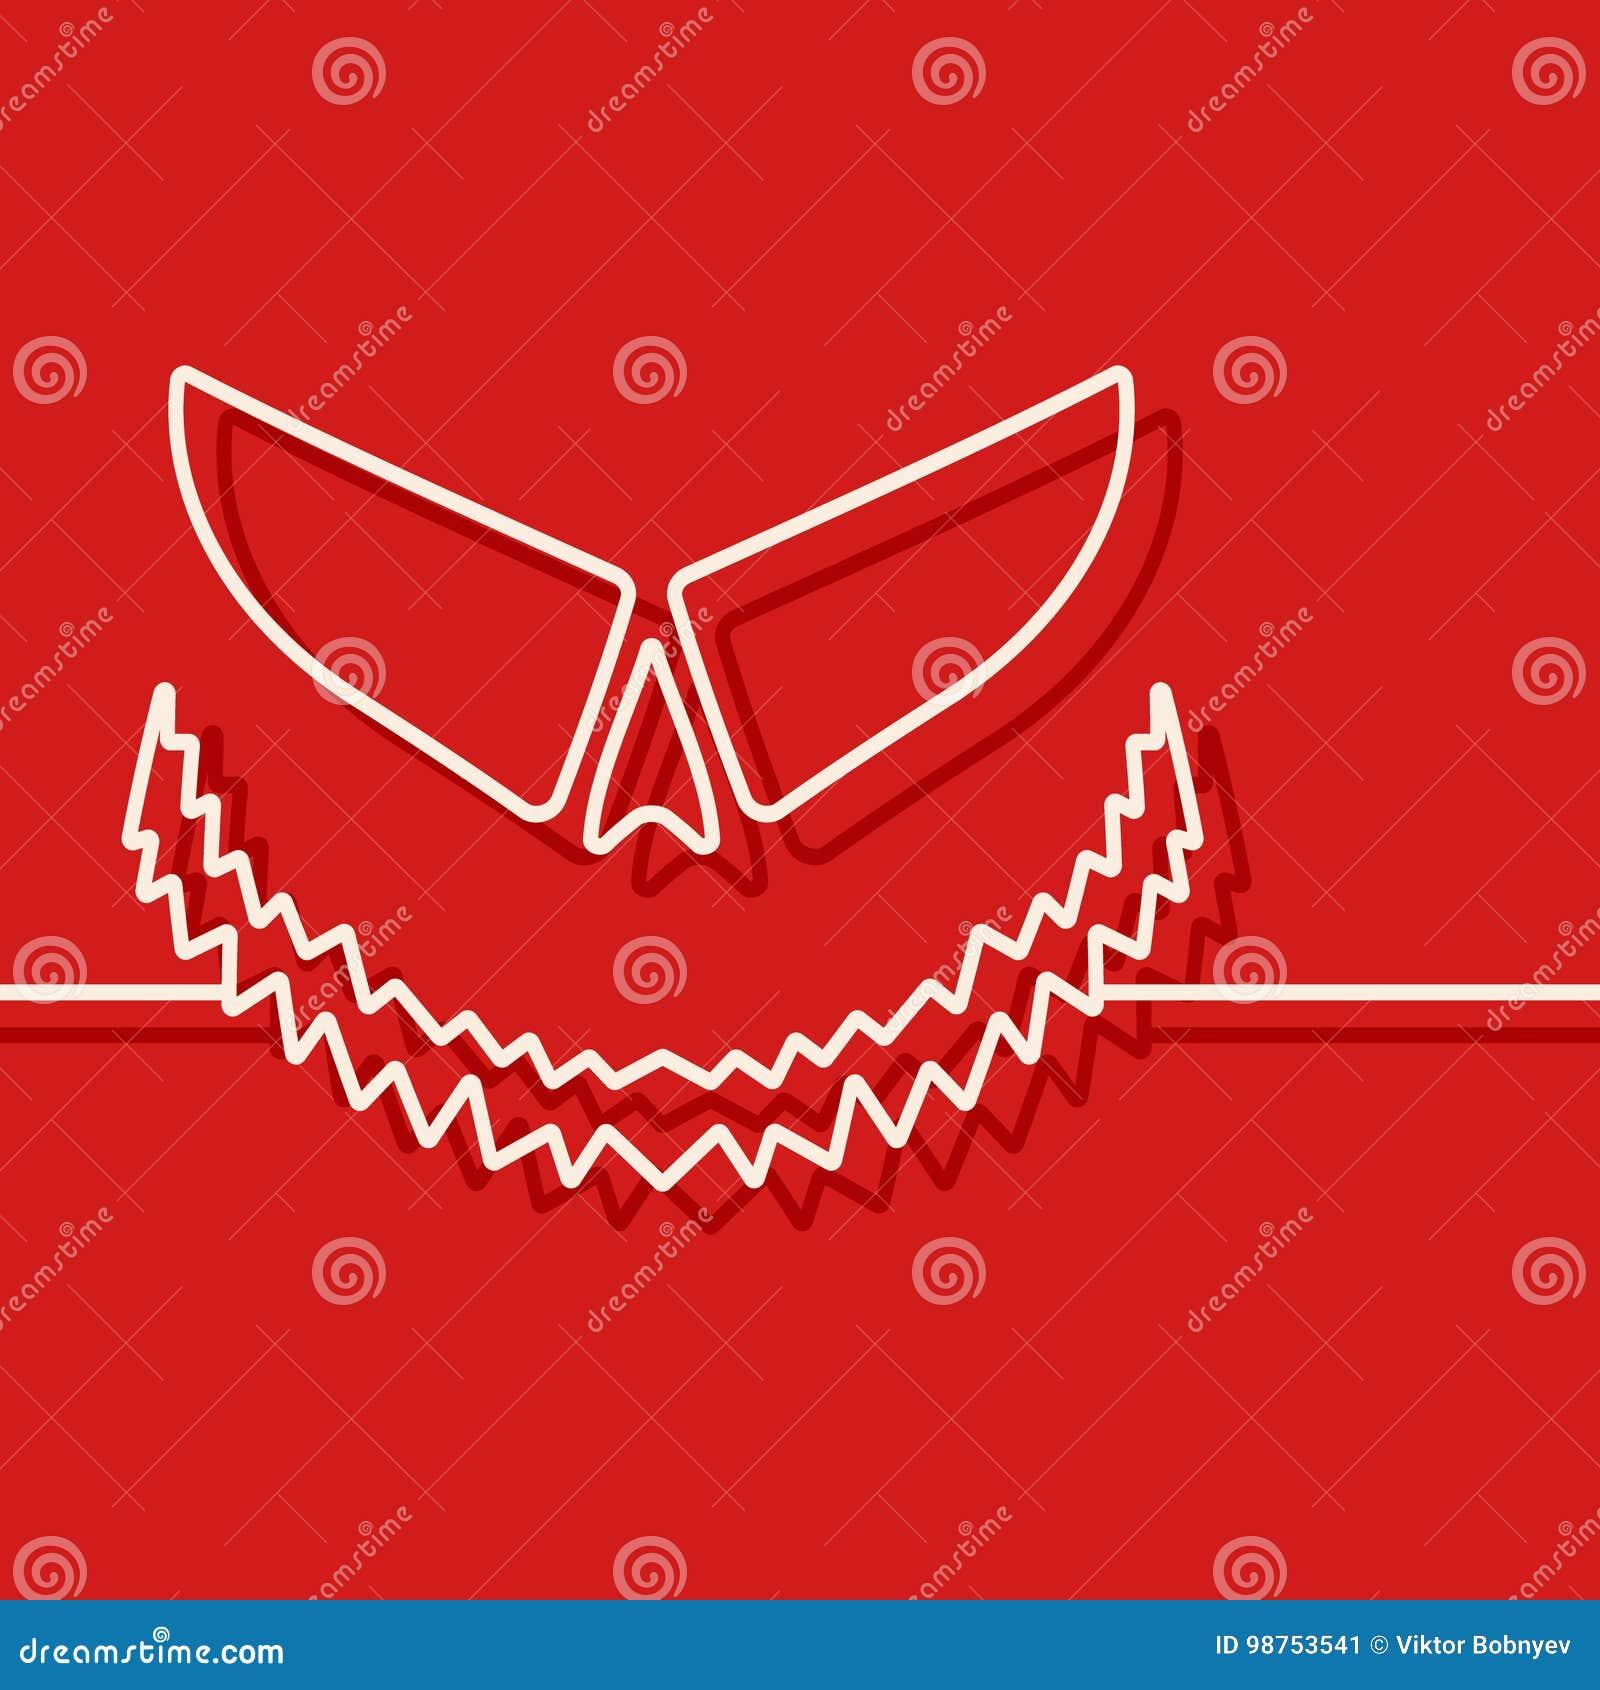 Halloween Scary Pumpkin Template Stock Vector - Illustration of ...